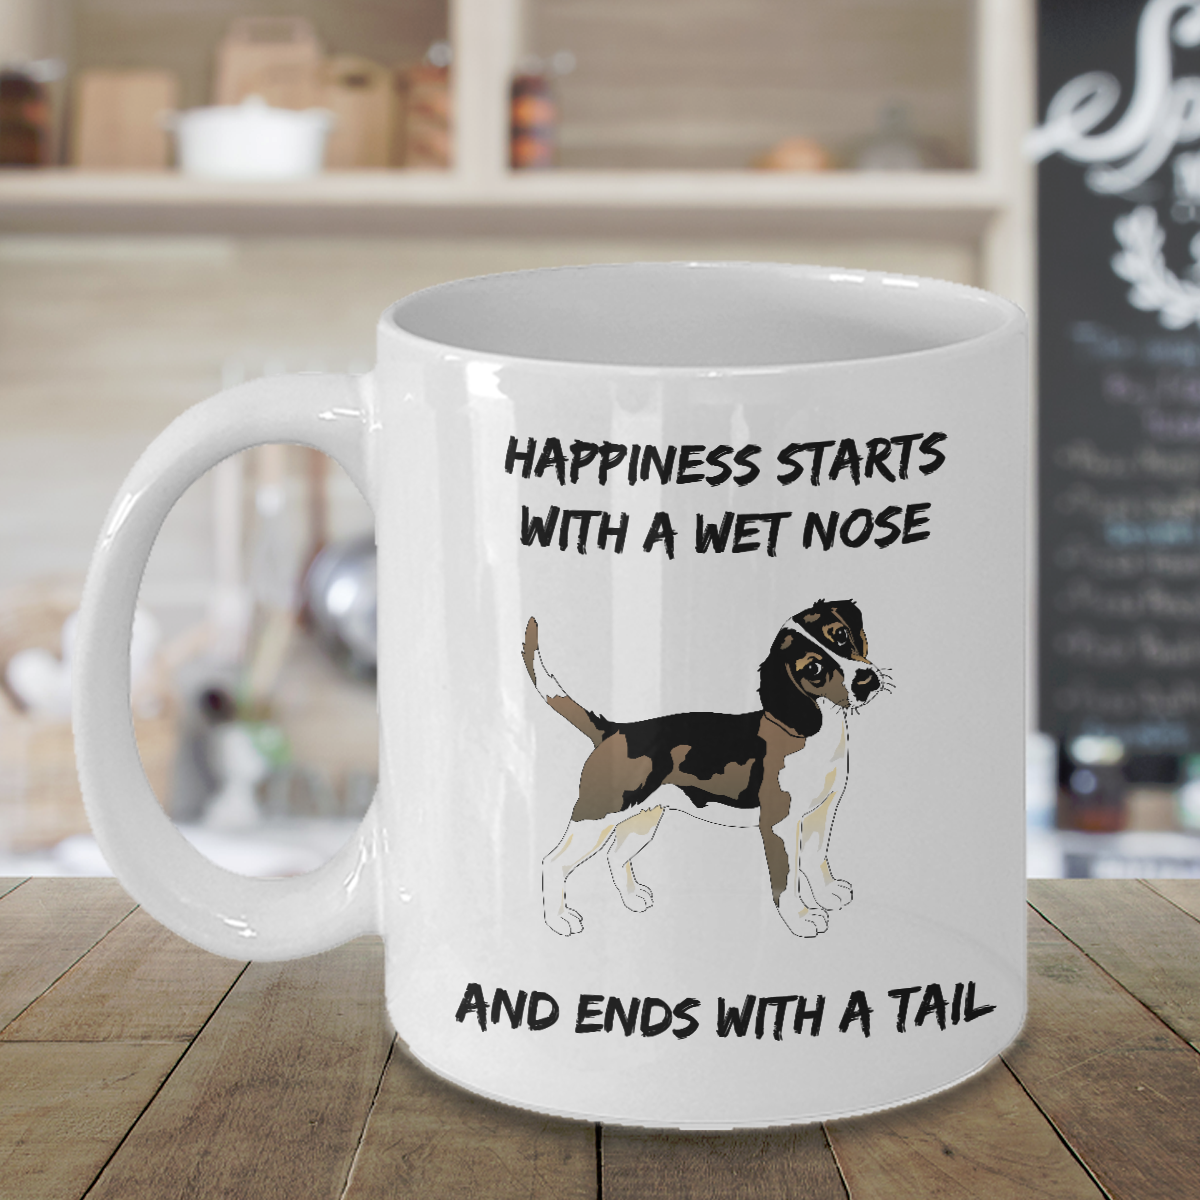 Birthday Funny Gift For Mom Mother Her Women Friend Girlfriend Customized Mug